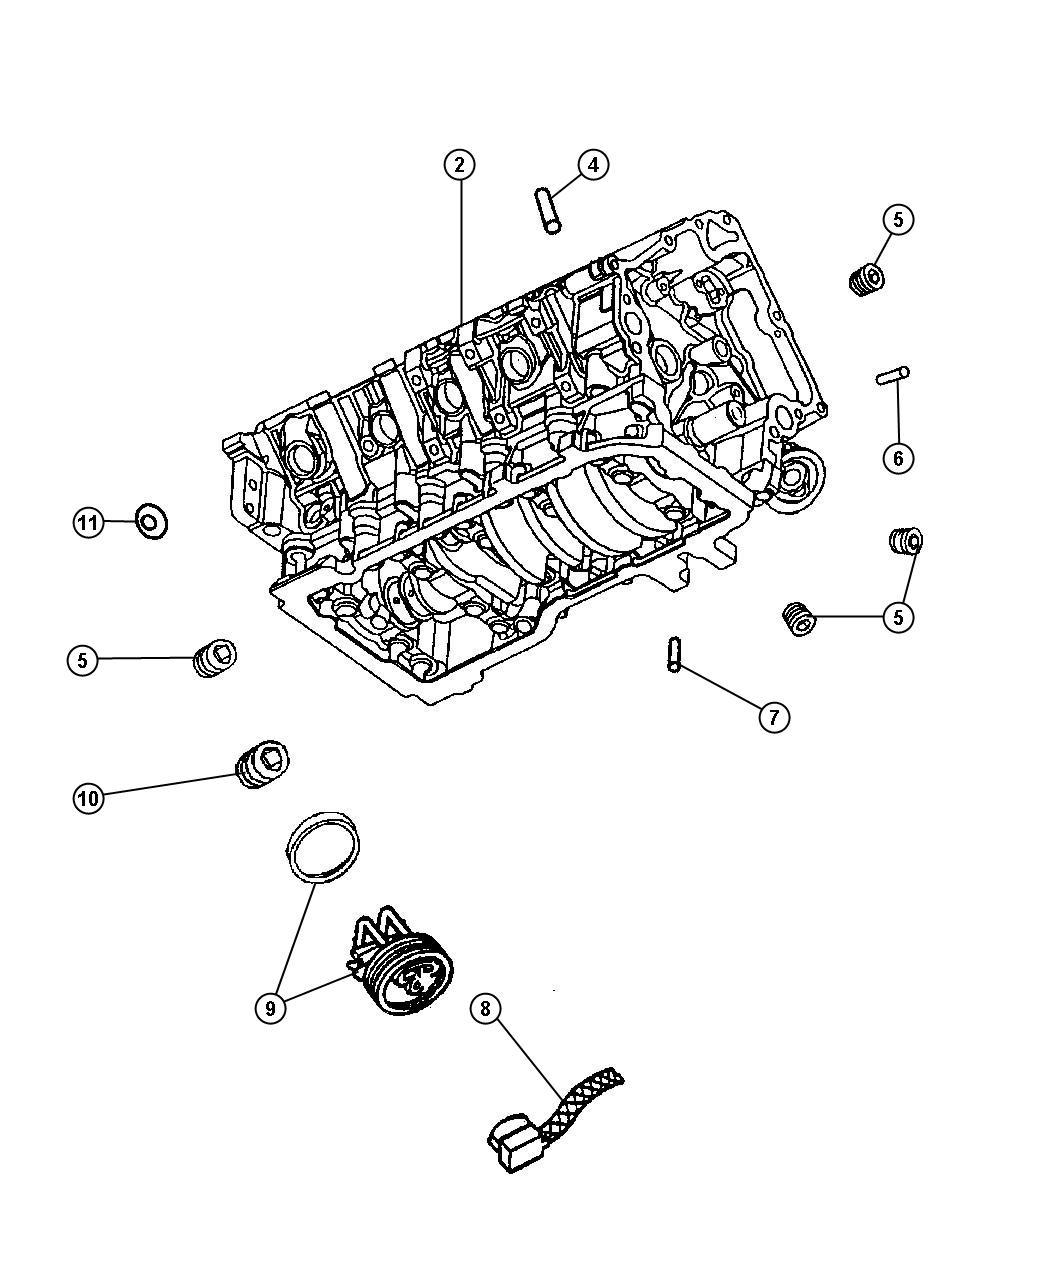 Deutz Diesel Engine Wiring Diagram in addition Dodge Ram 4 7l Engine Remanufactured further Ford 8n Clutch Diagram furthermore Unreal Engine4 moreover 350 Chevy Engine Diagram. on engine4 4